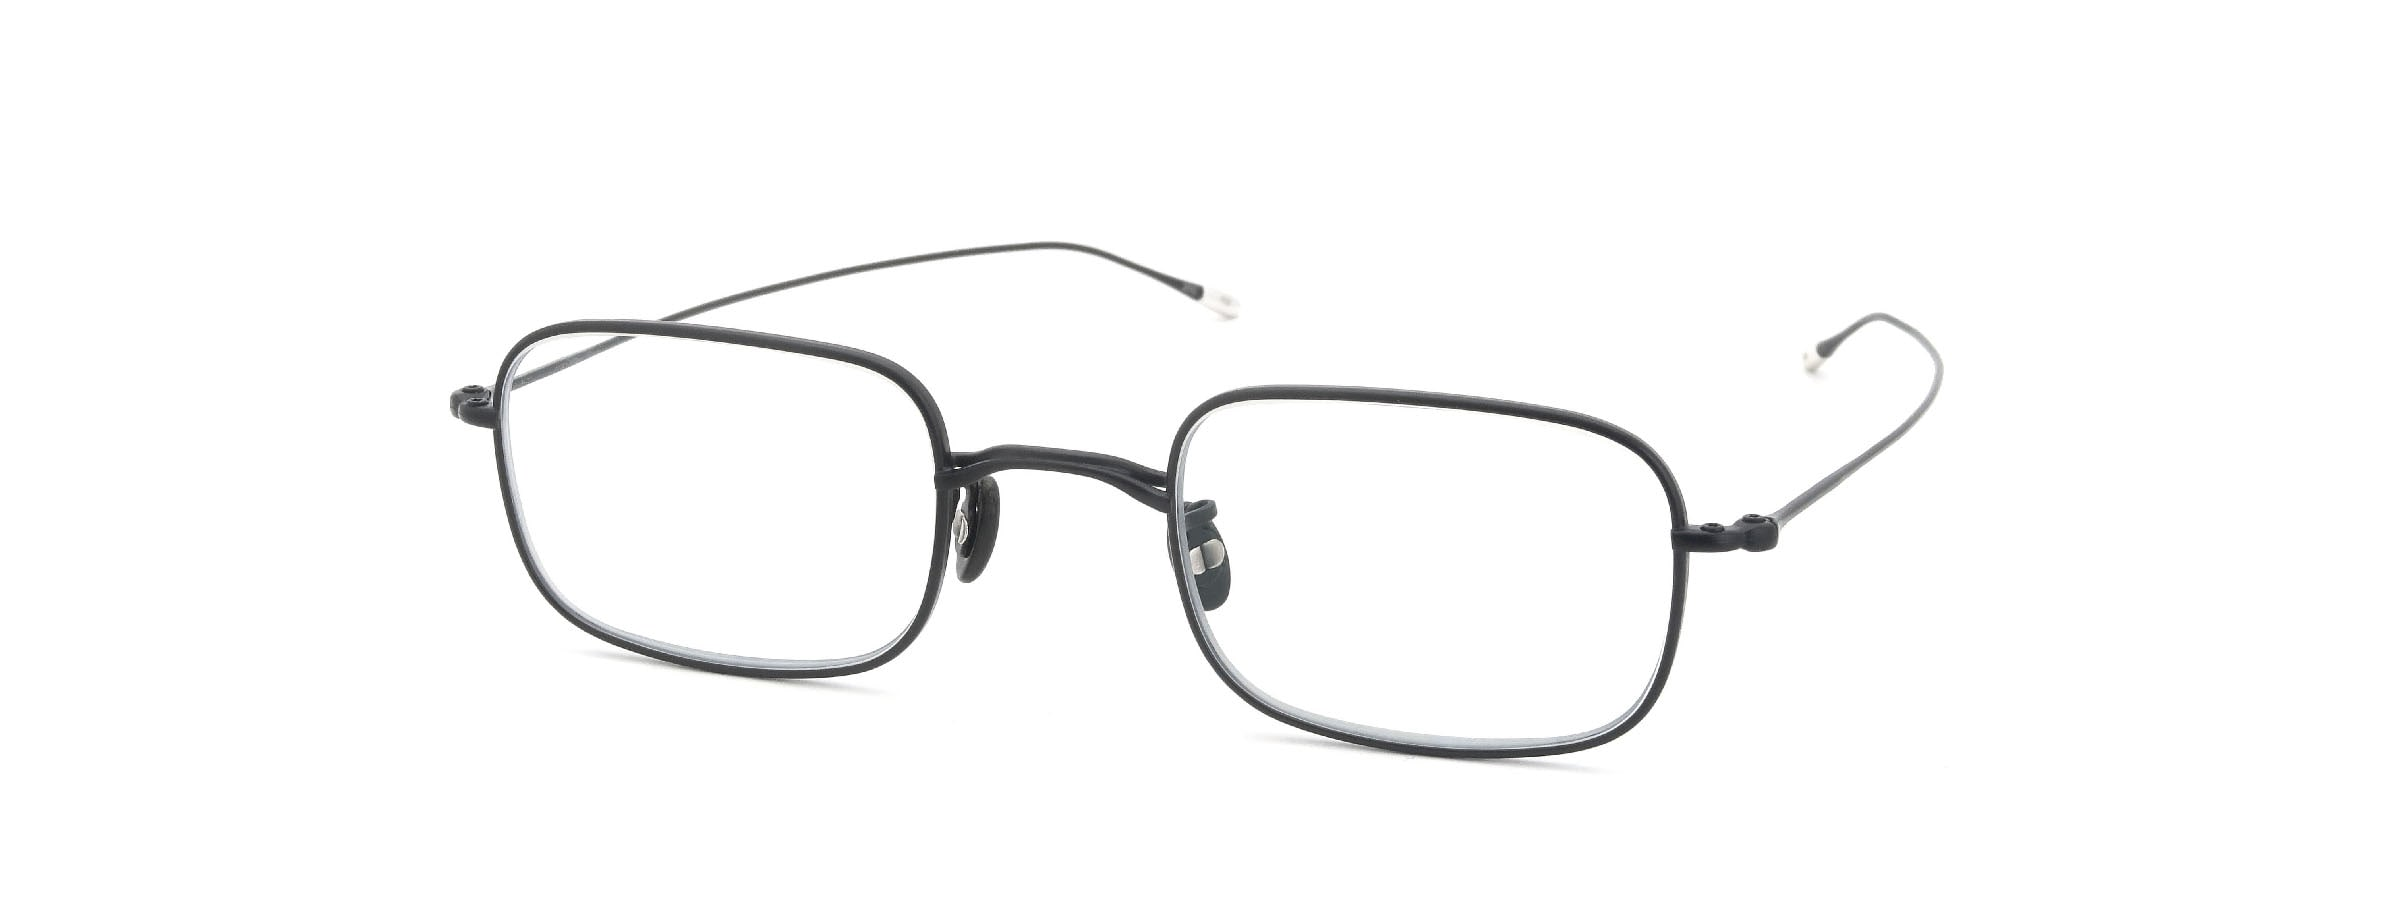 10 eyevan NO.8 47size